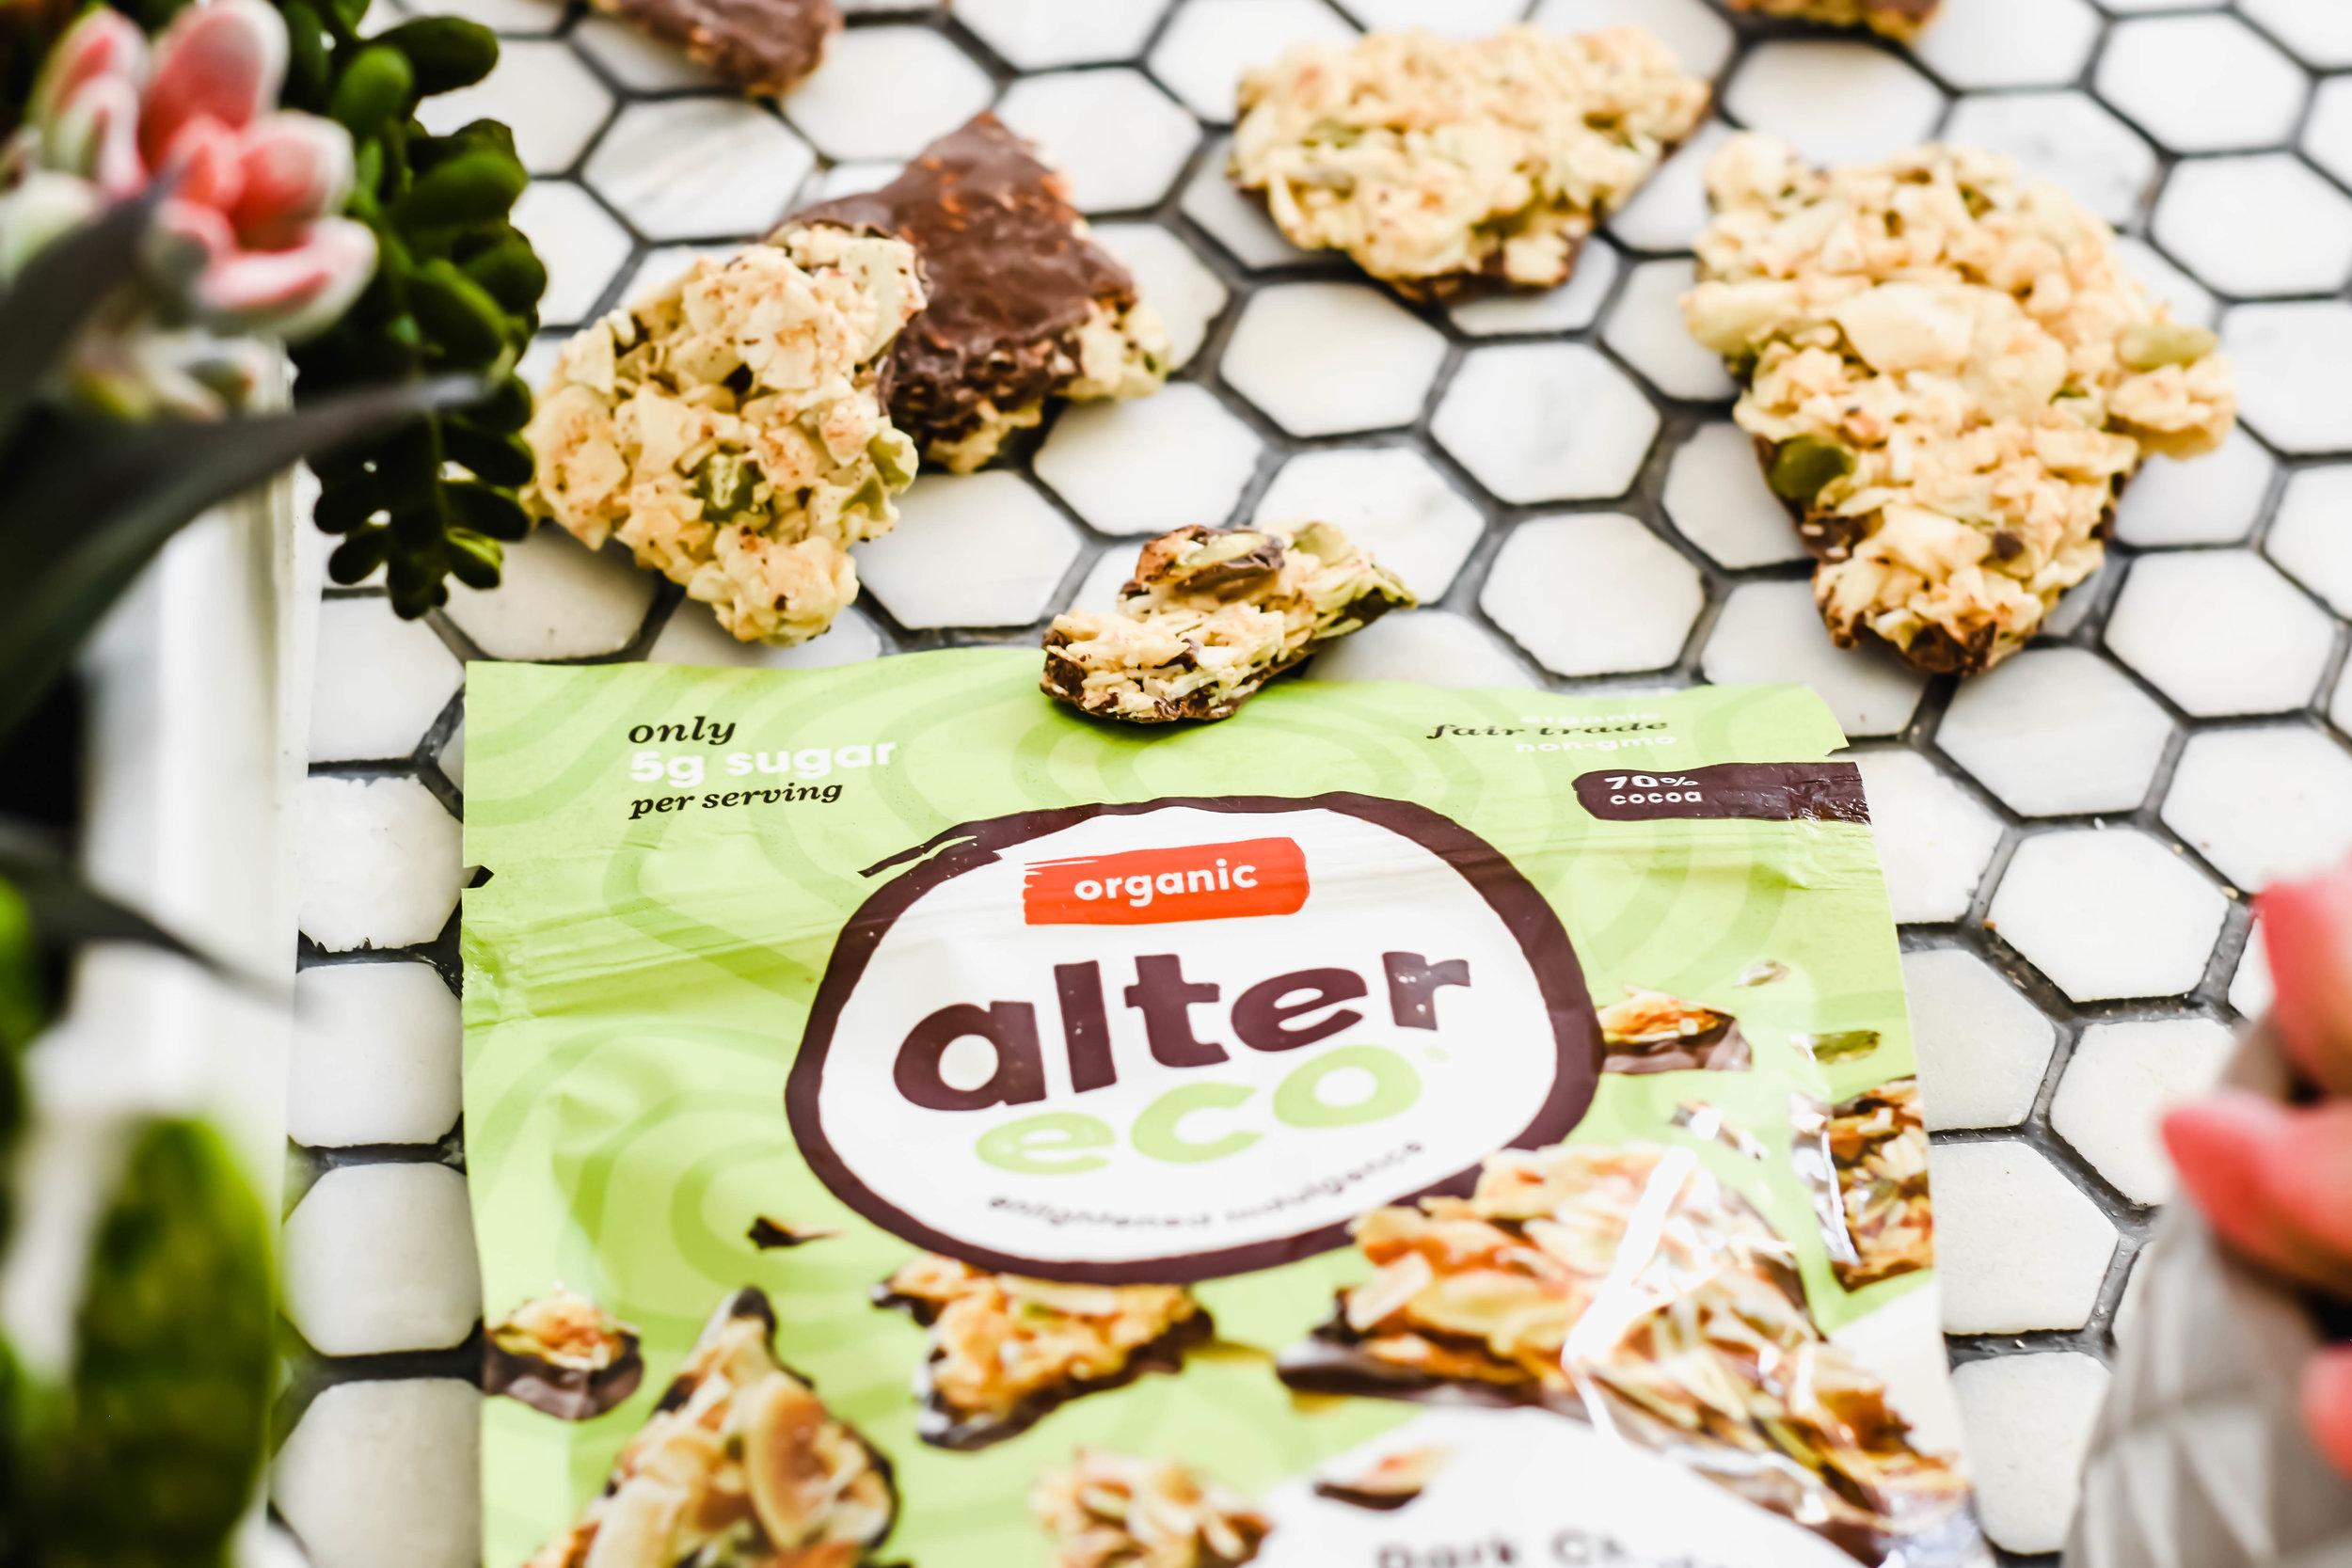 Altero Eco x American Gluten Free-5.jpg